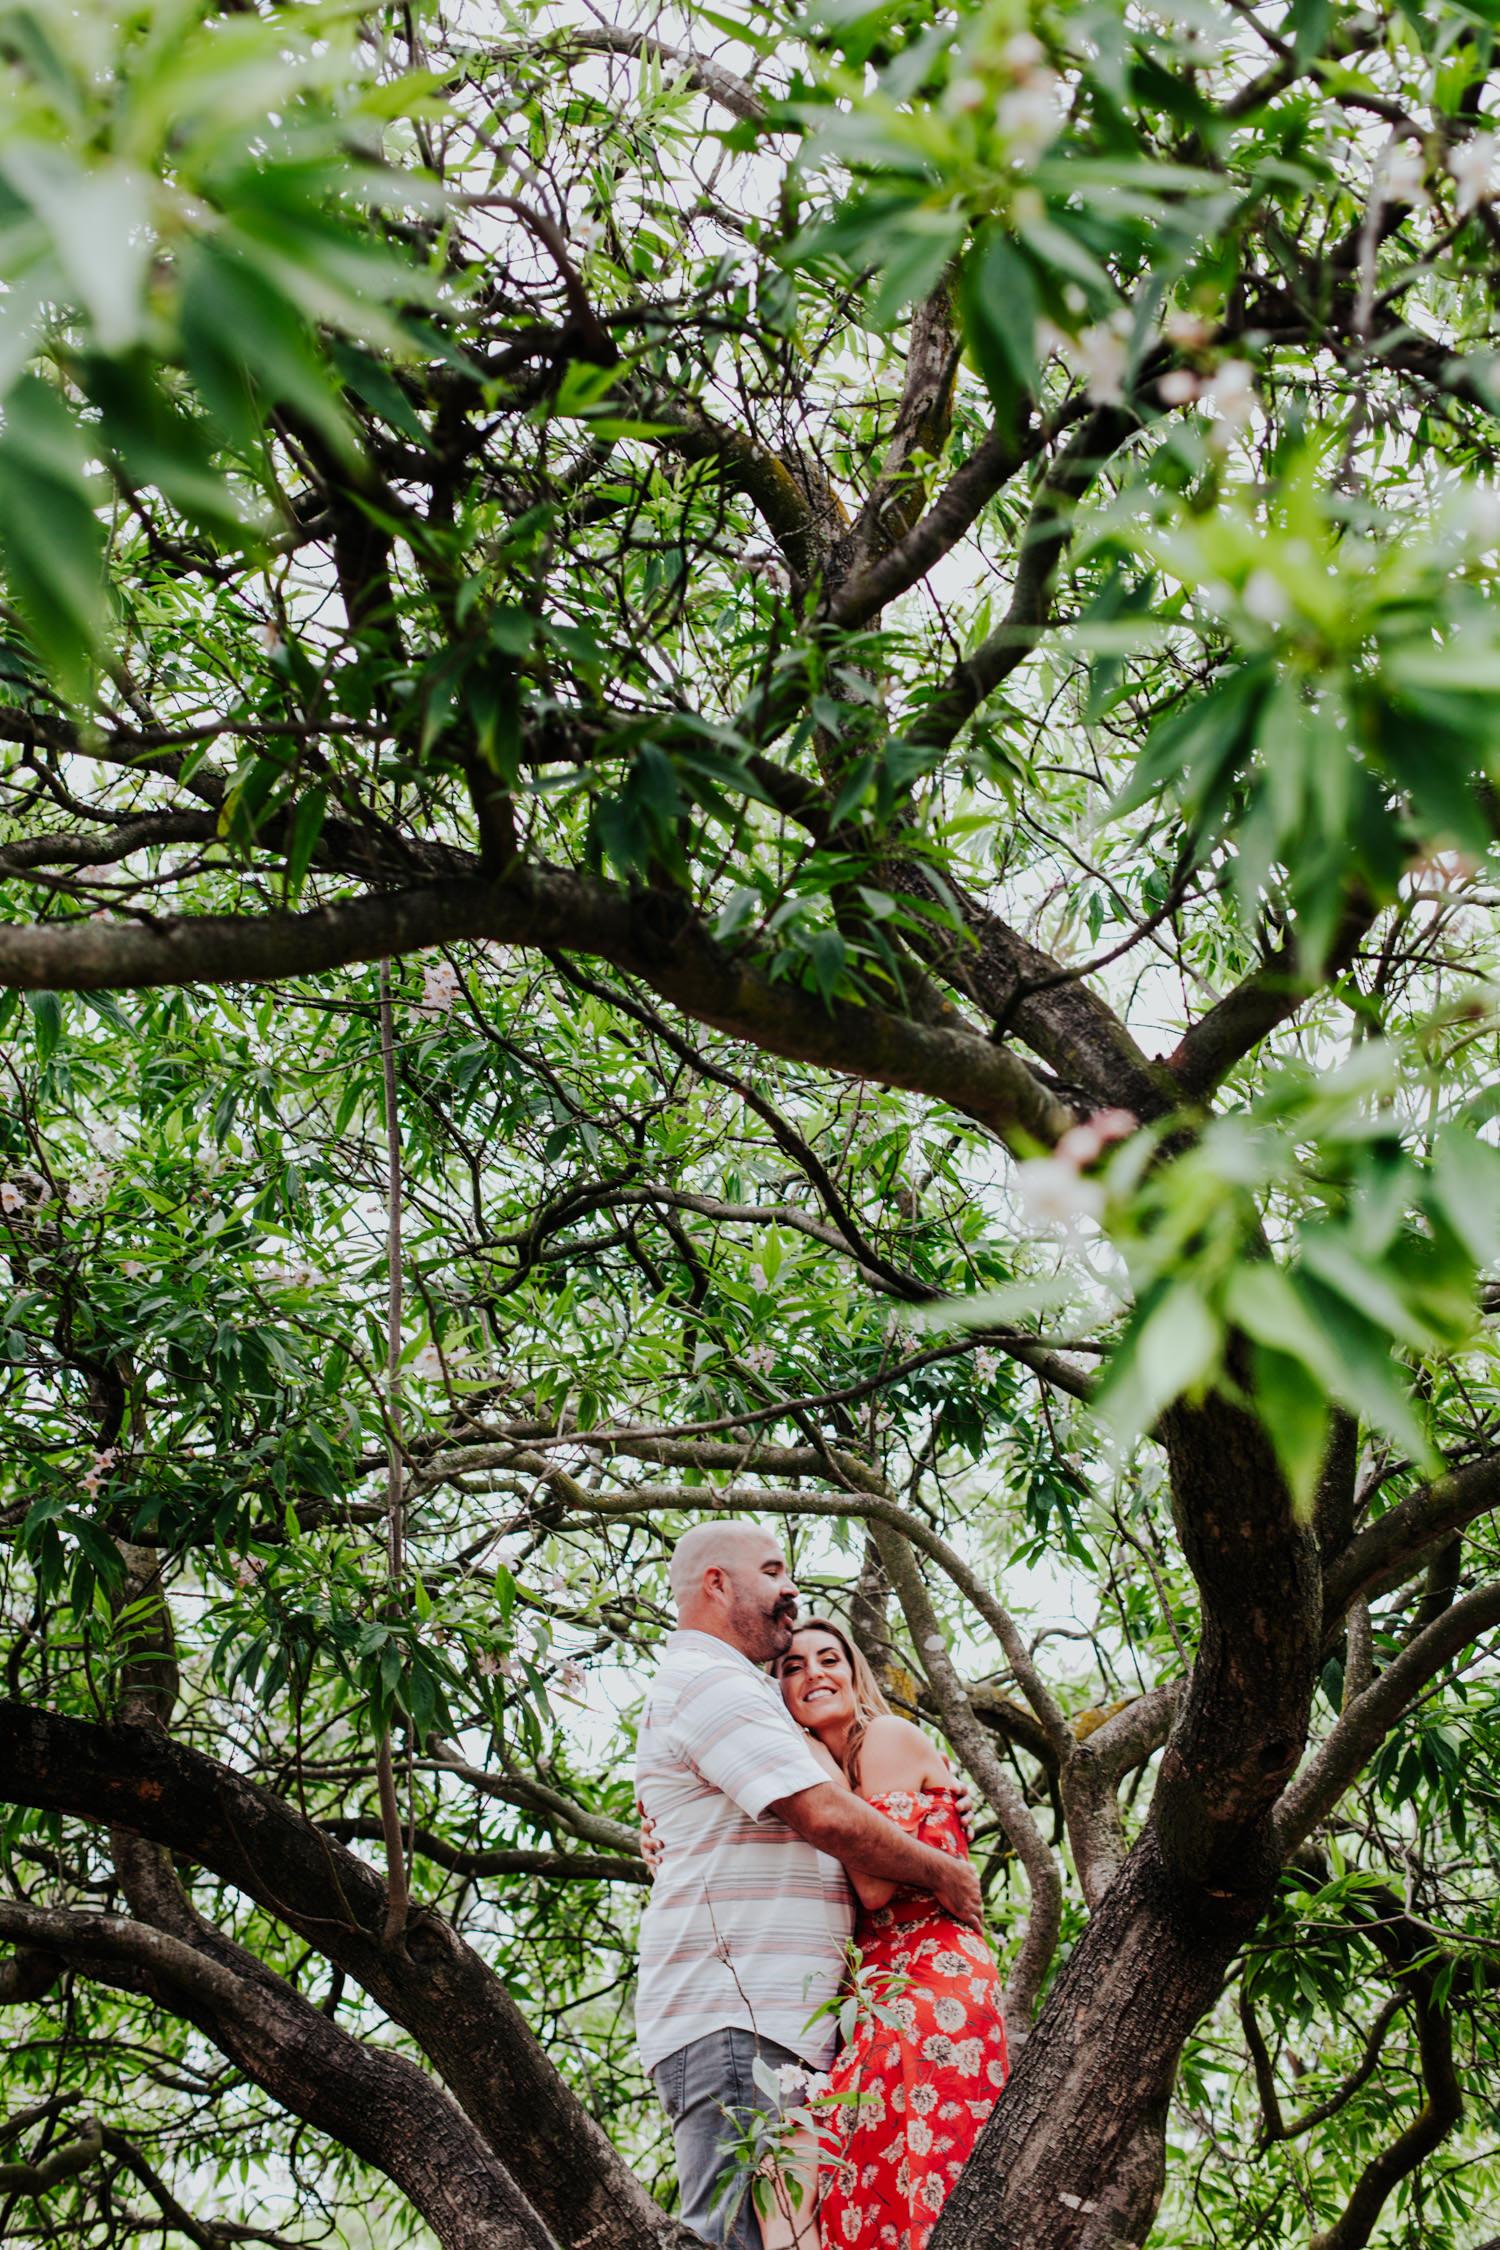 terranea-resort-palos-verdes-california-wedding-photography-cove-los-angeles-pierce-80.jpg